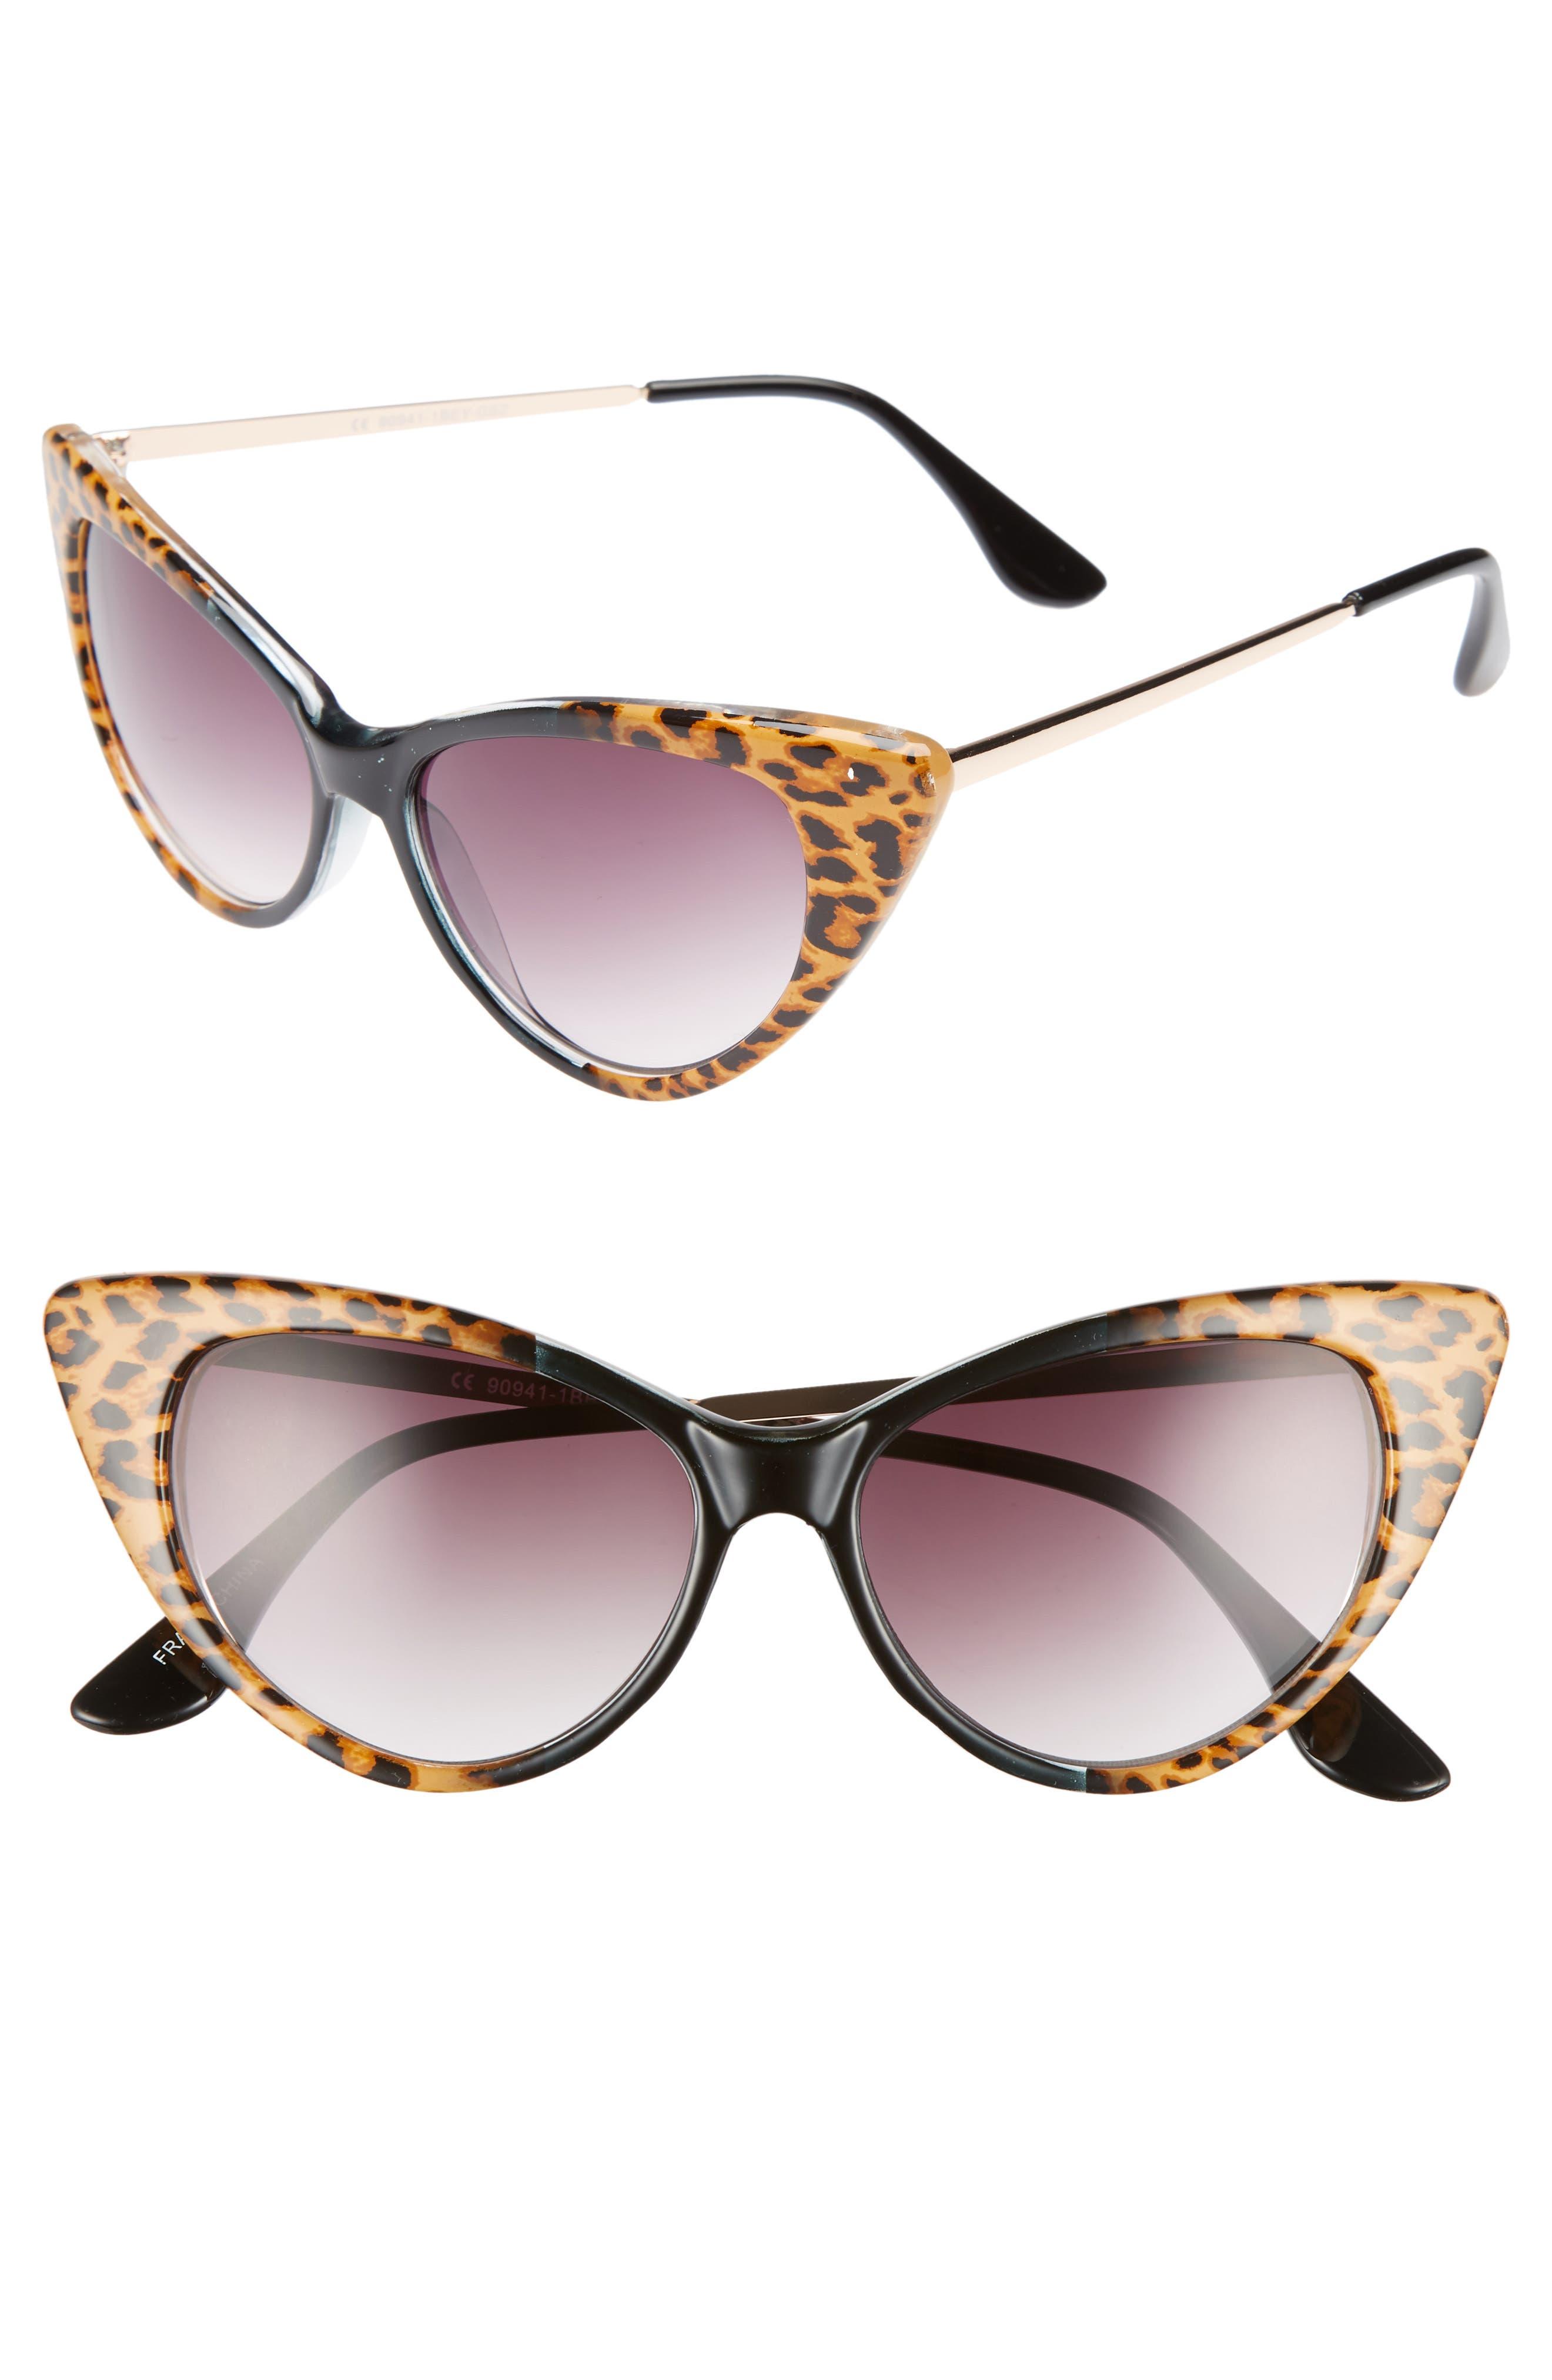 GLANCE EYEWEAR 62mm Leopard Print Cat Eye Sunglasses, Main, color, 001